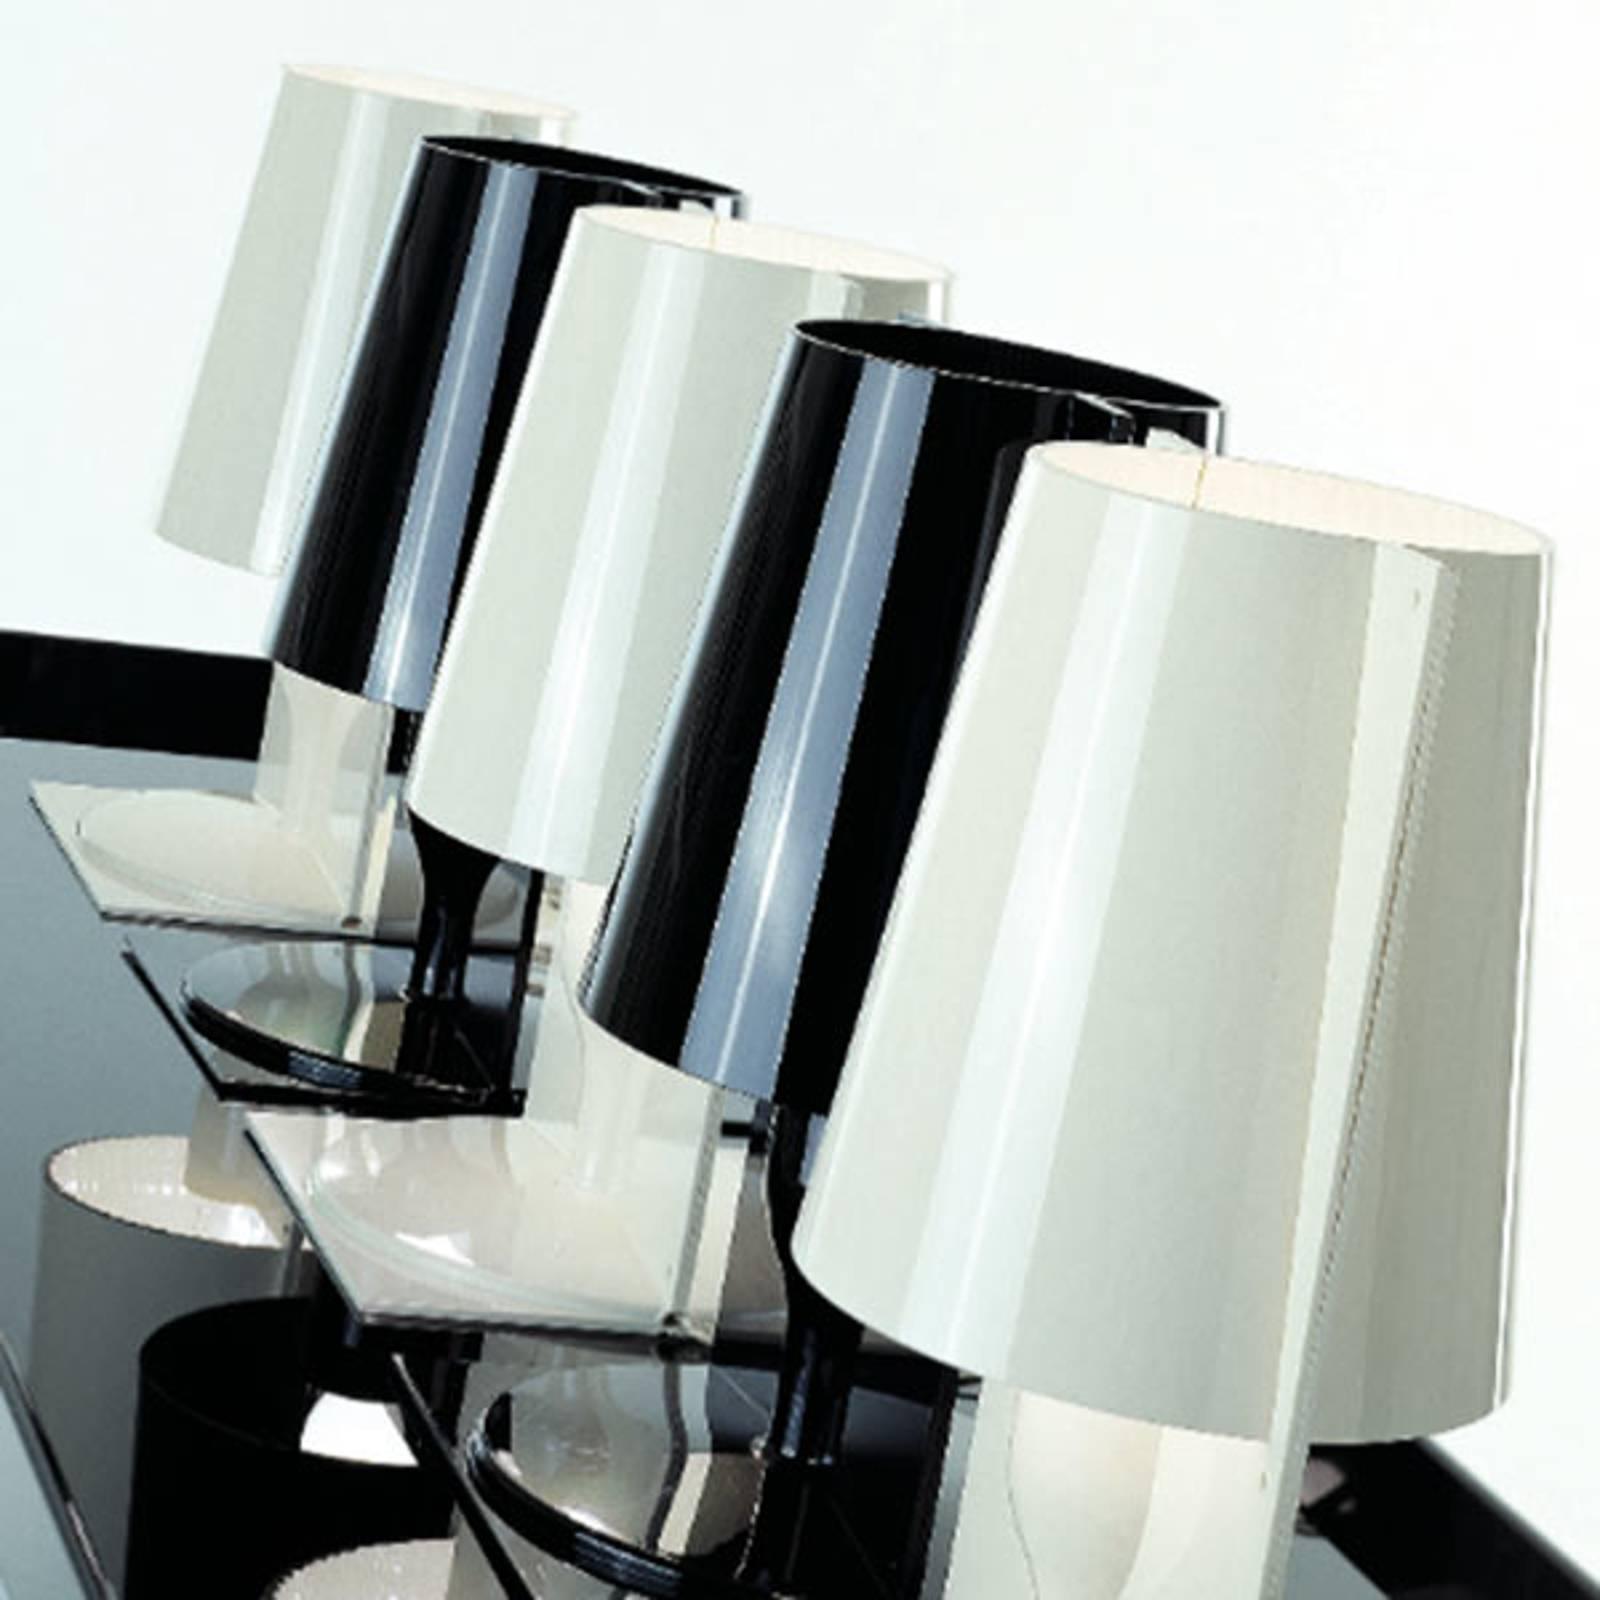 Kartell Take lampe à poser de designer, blanche